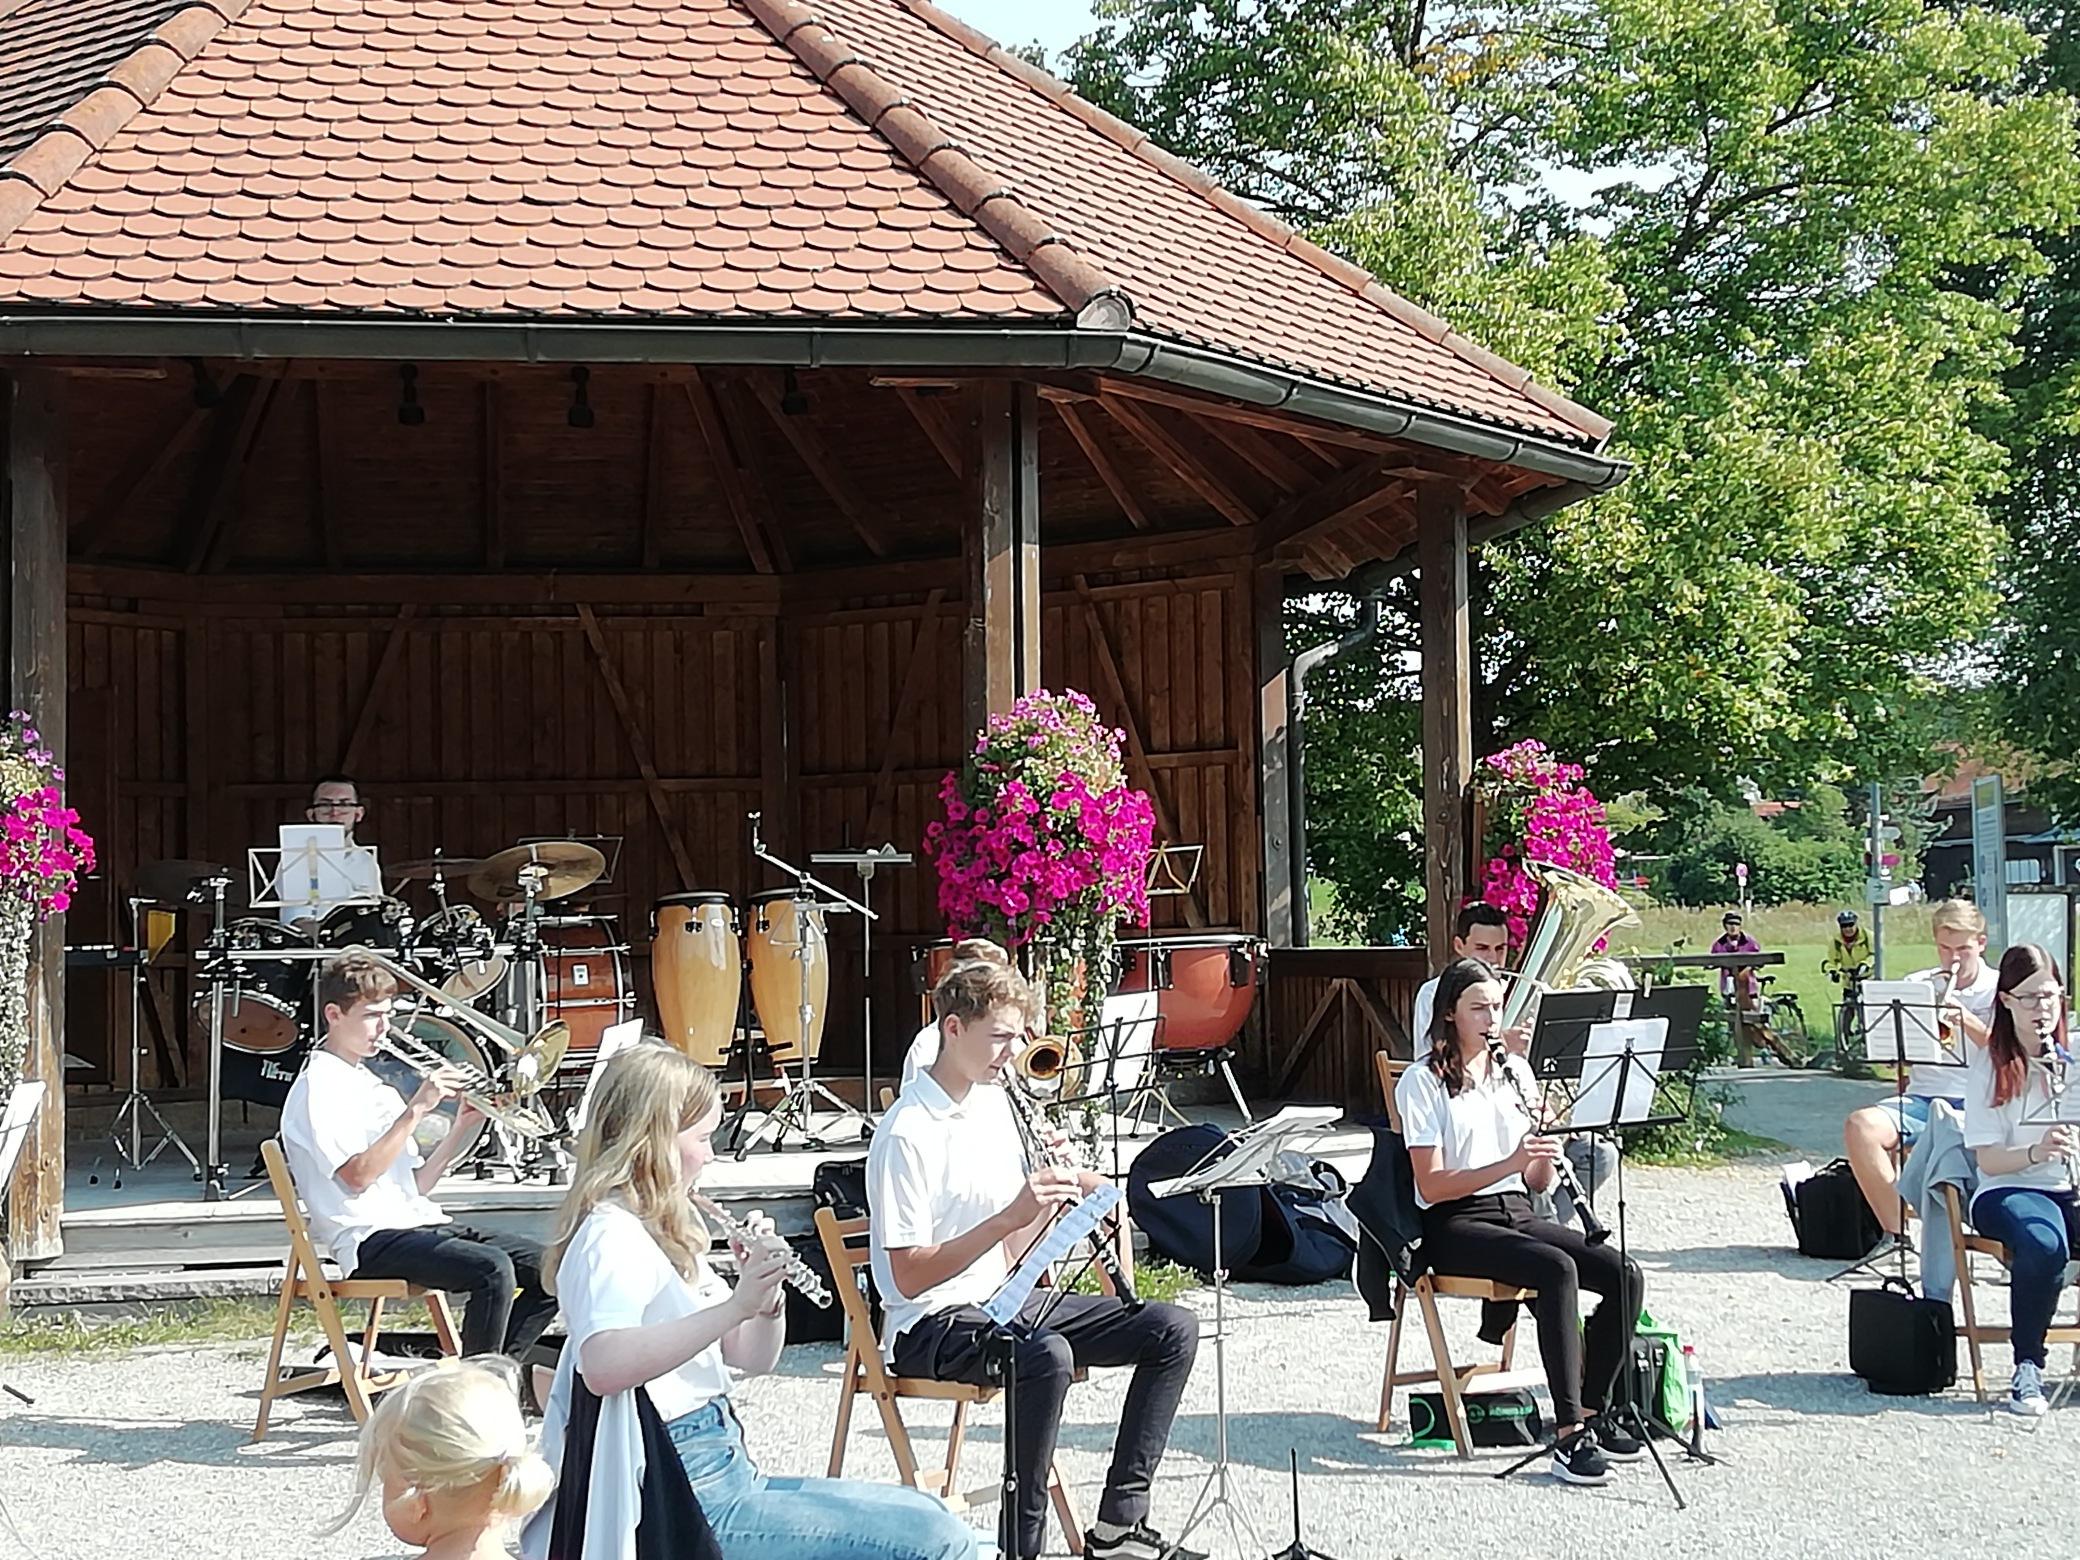 Jugendkapelle Weissensee